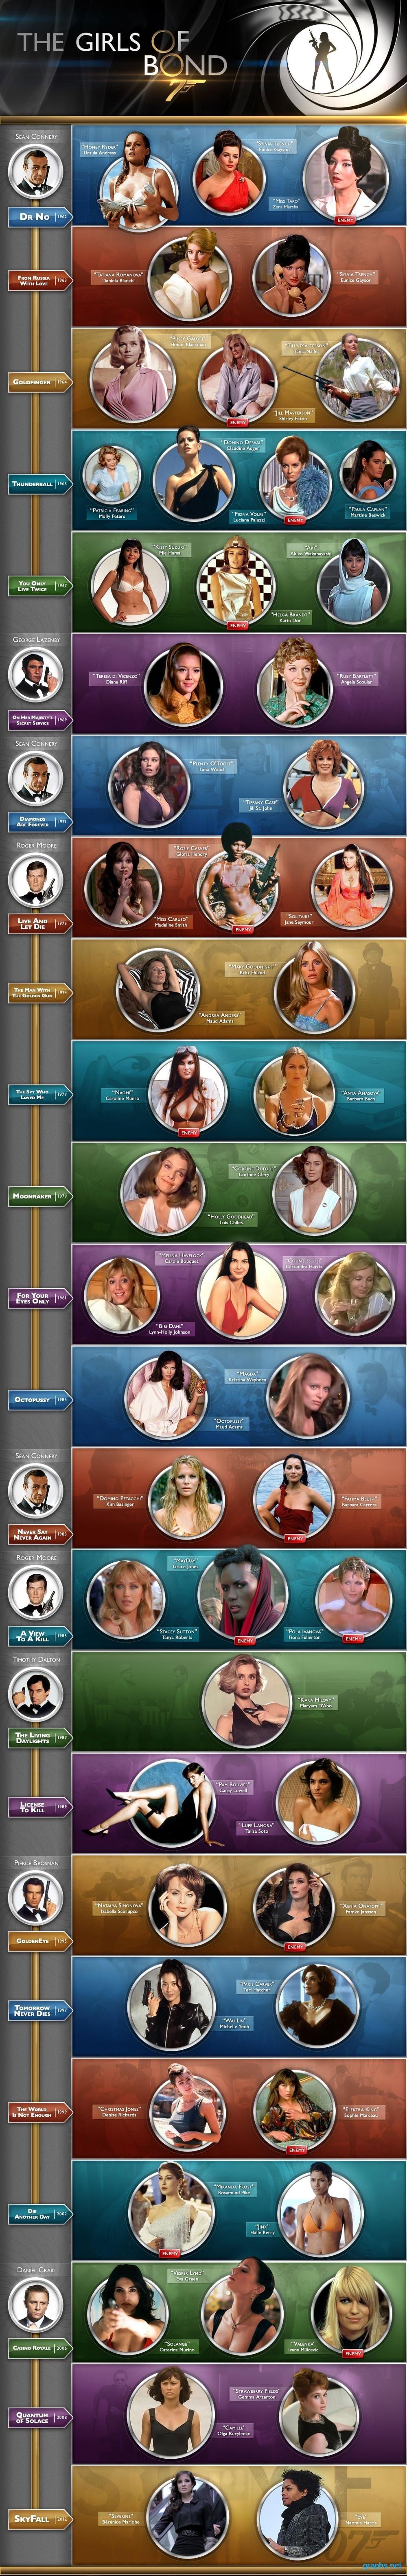 girls of bond chart